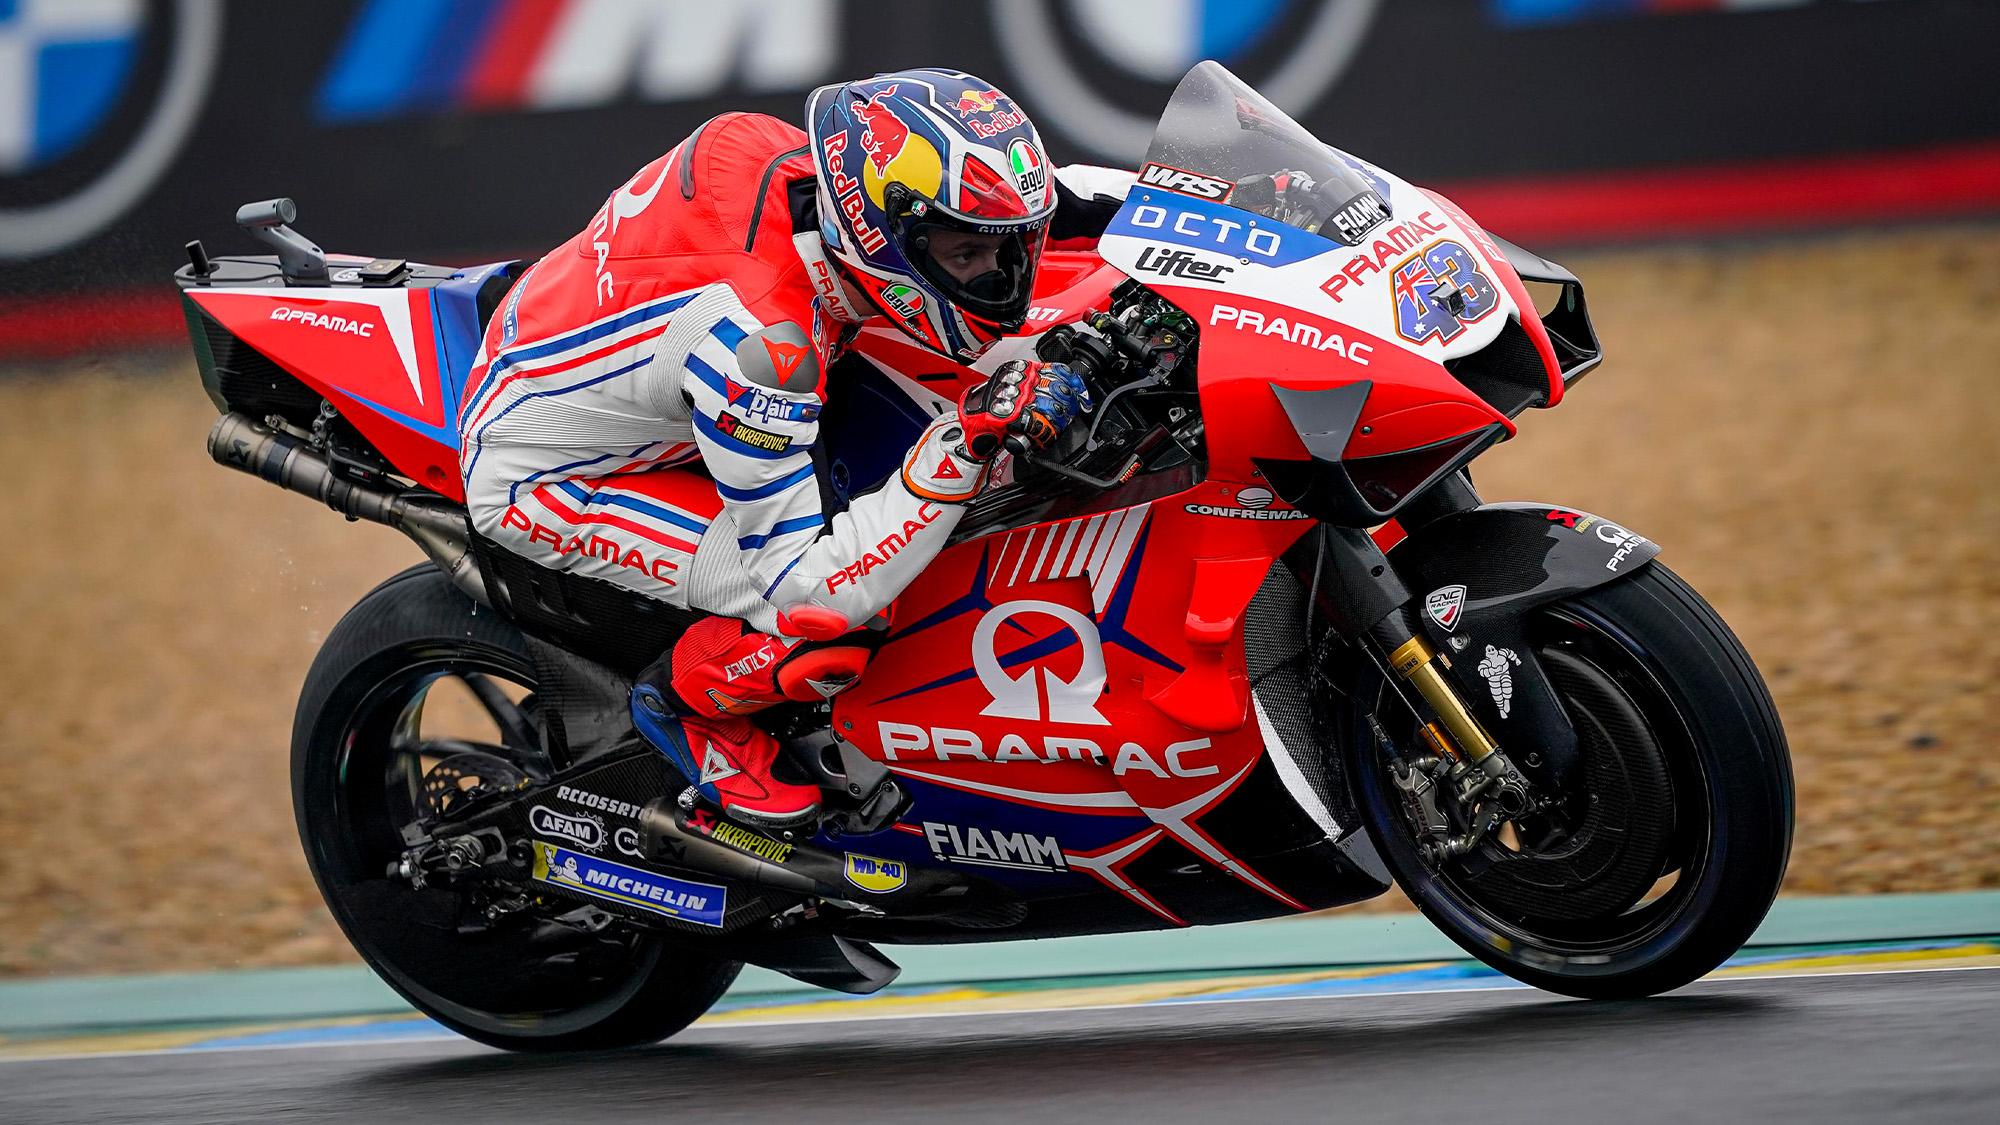 Jack Miller at Le Mans in the 2020 MotoGP French Grand Prix